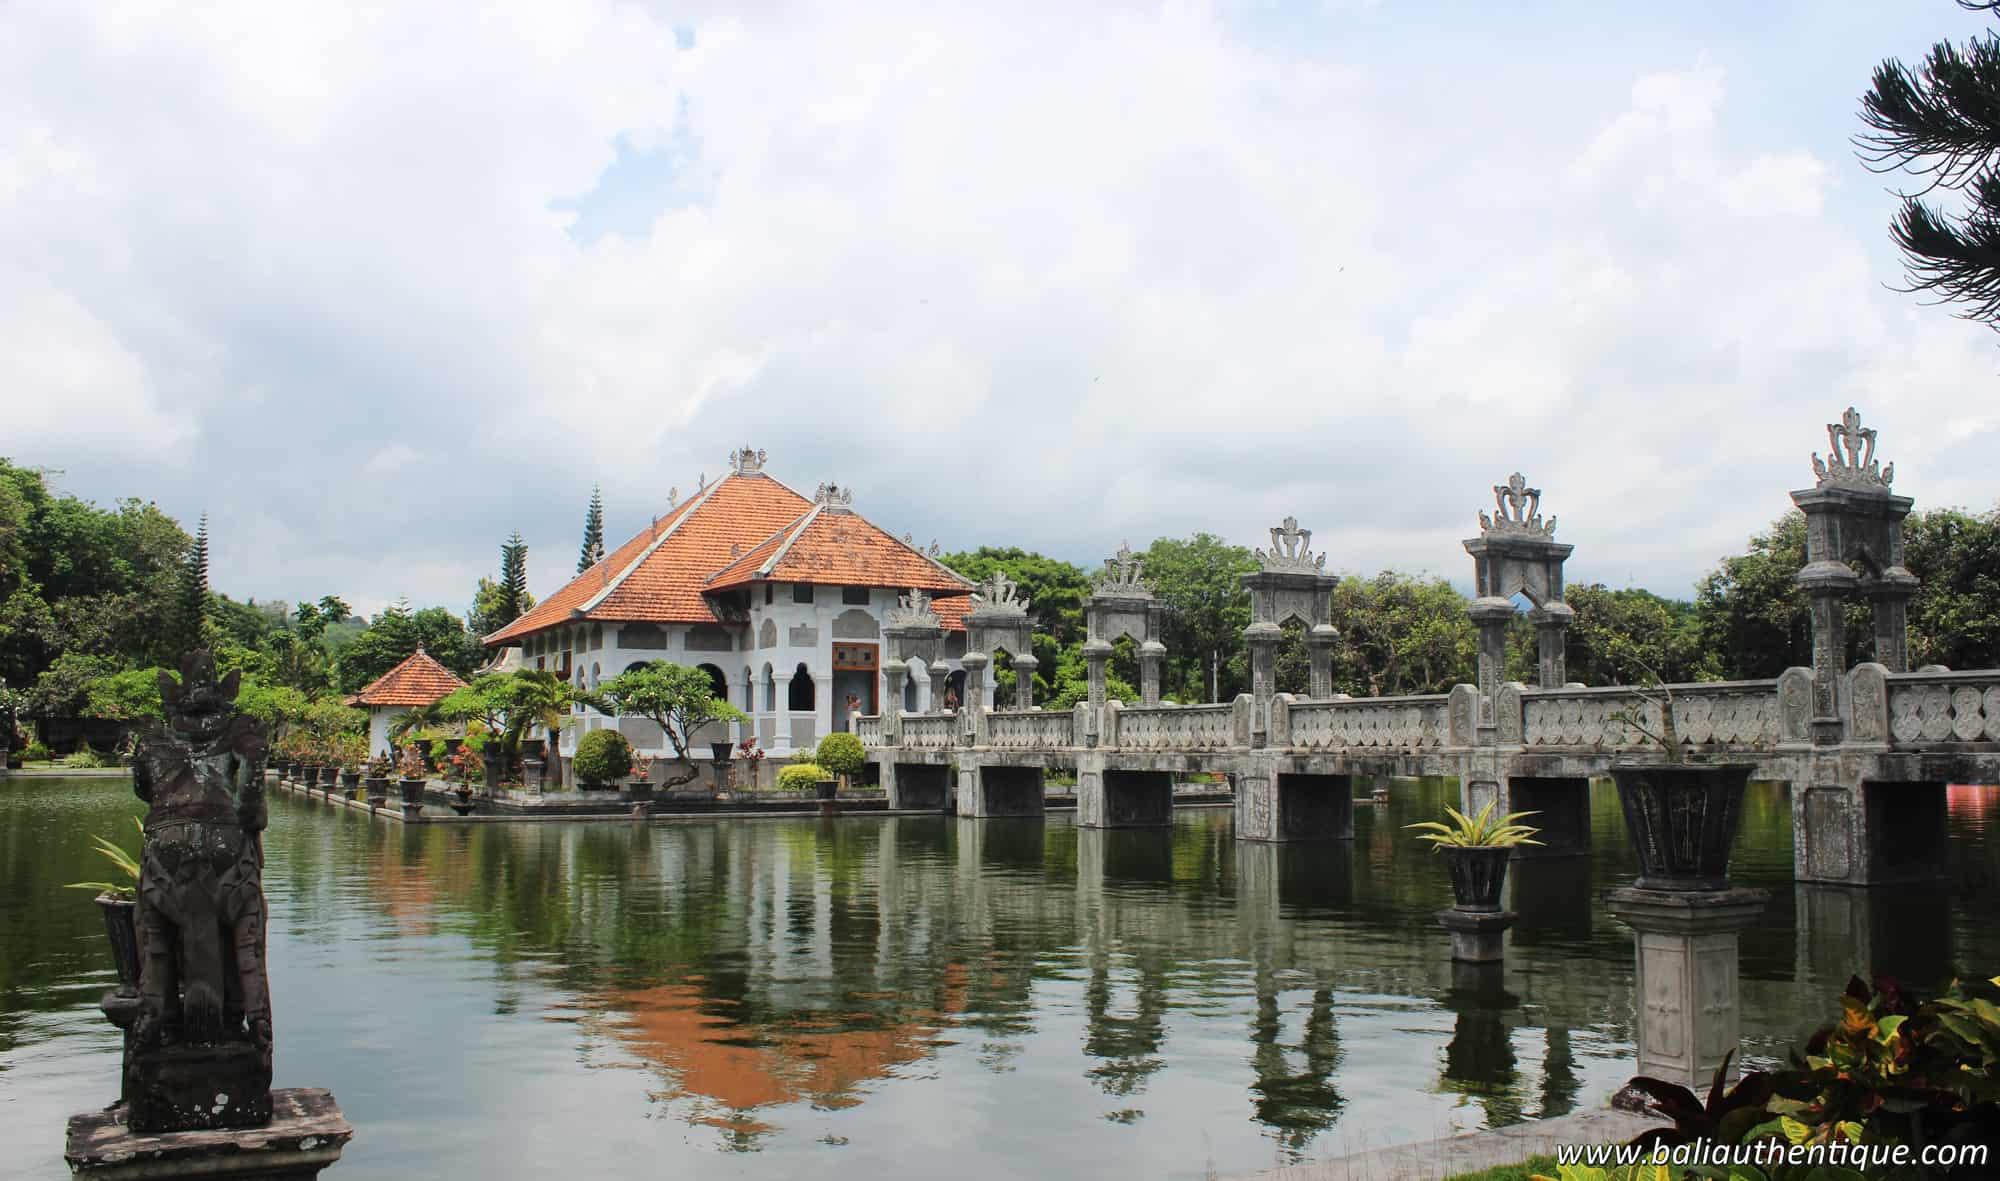 Bali ujung karangasem piscine pano